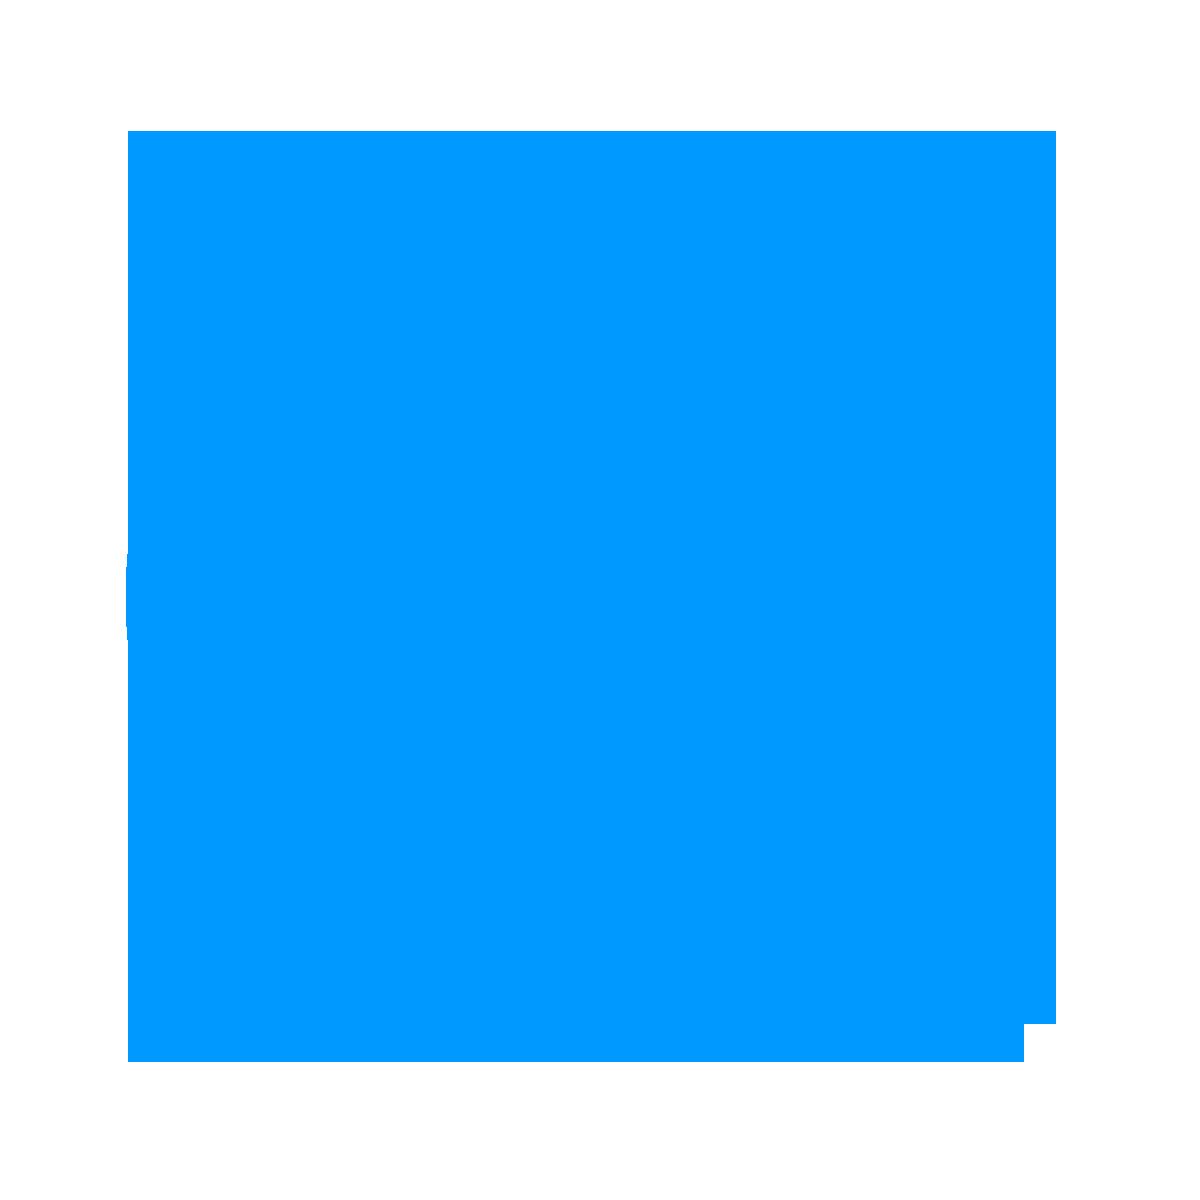 EarthIconBlue Technology